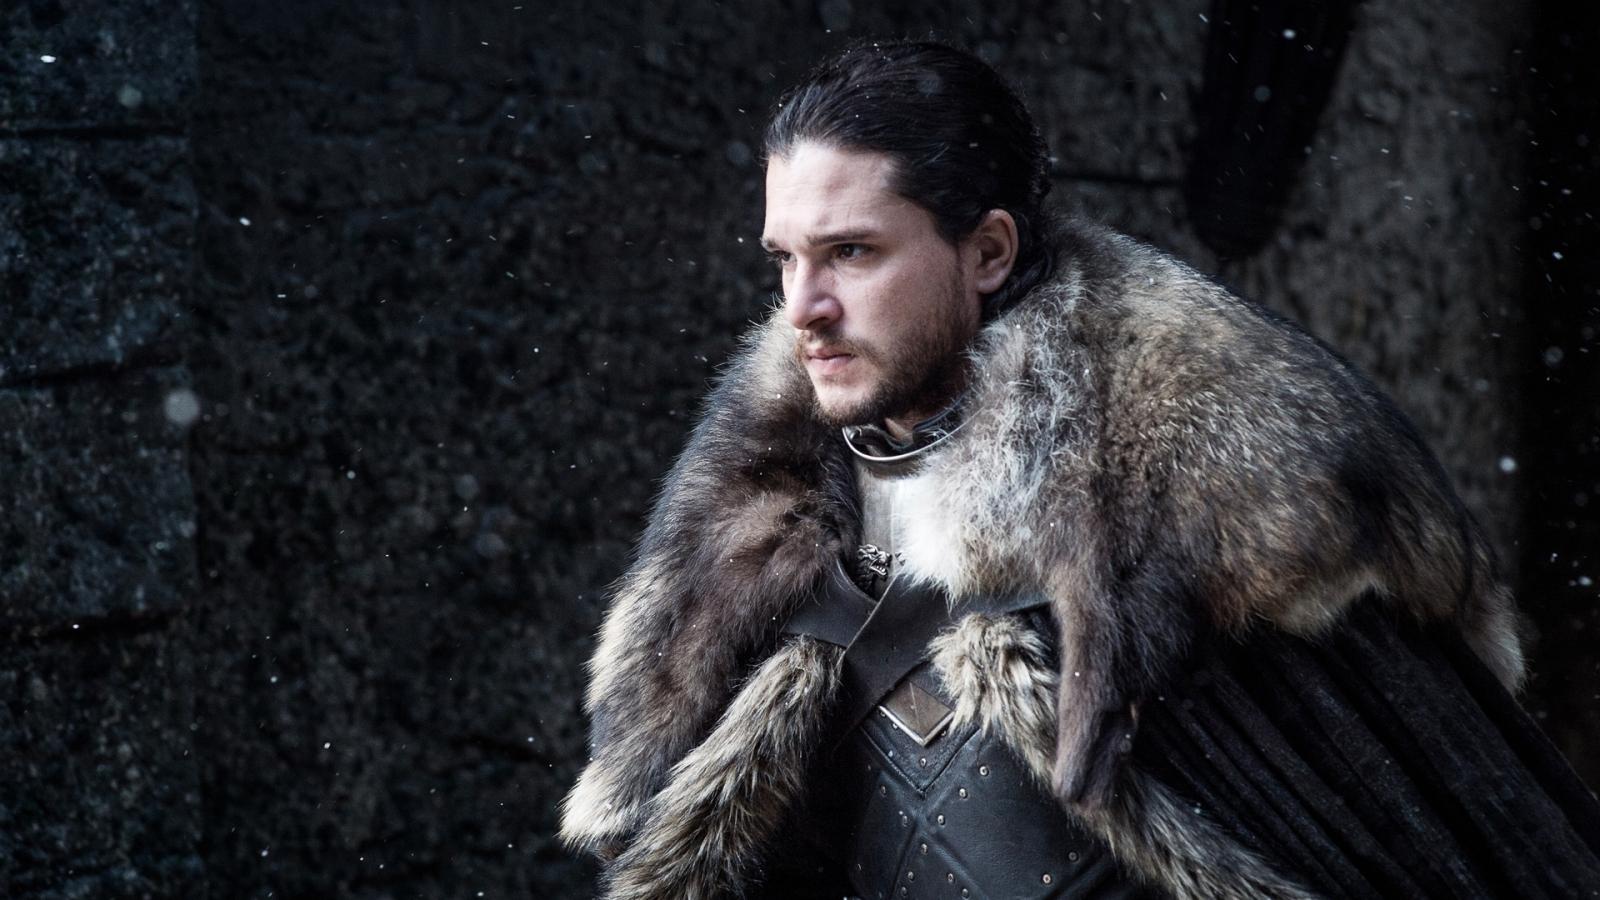 Game of Thrones season 8 Kit Harington